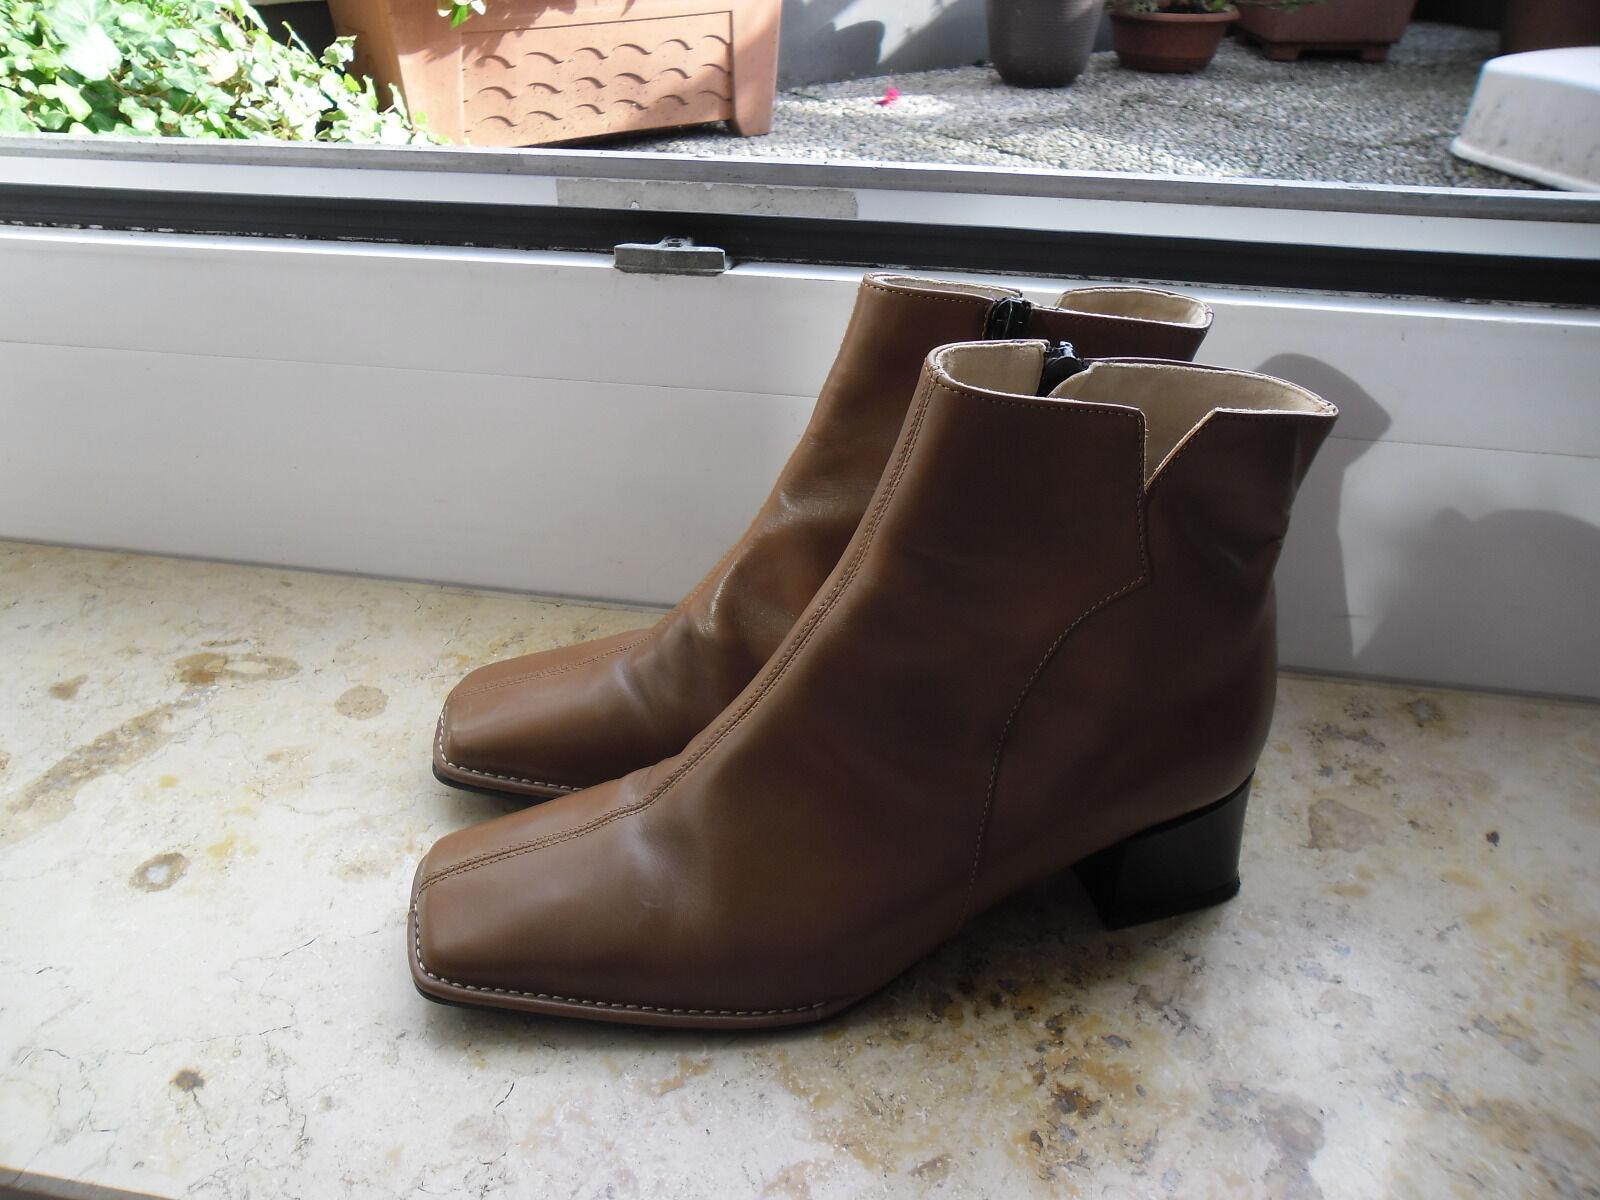 Ara Stiefel Stiefeletten Schuhe Echtleder 40 6,5 6 1/2 braun neu + Lied Biba B.